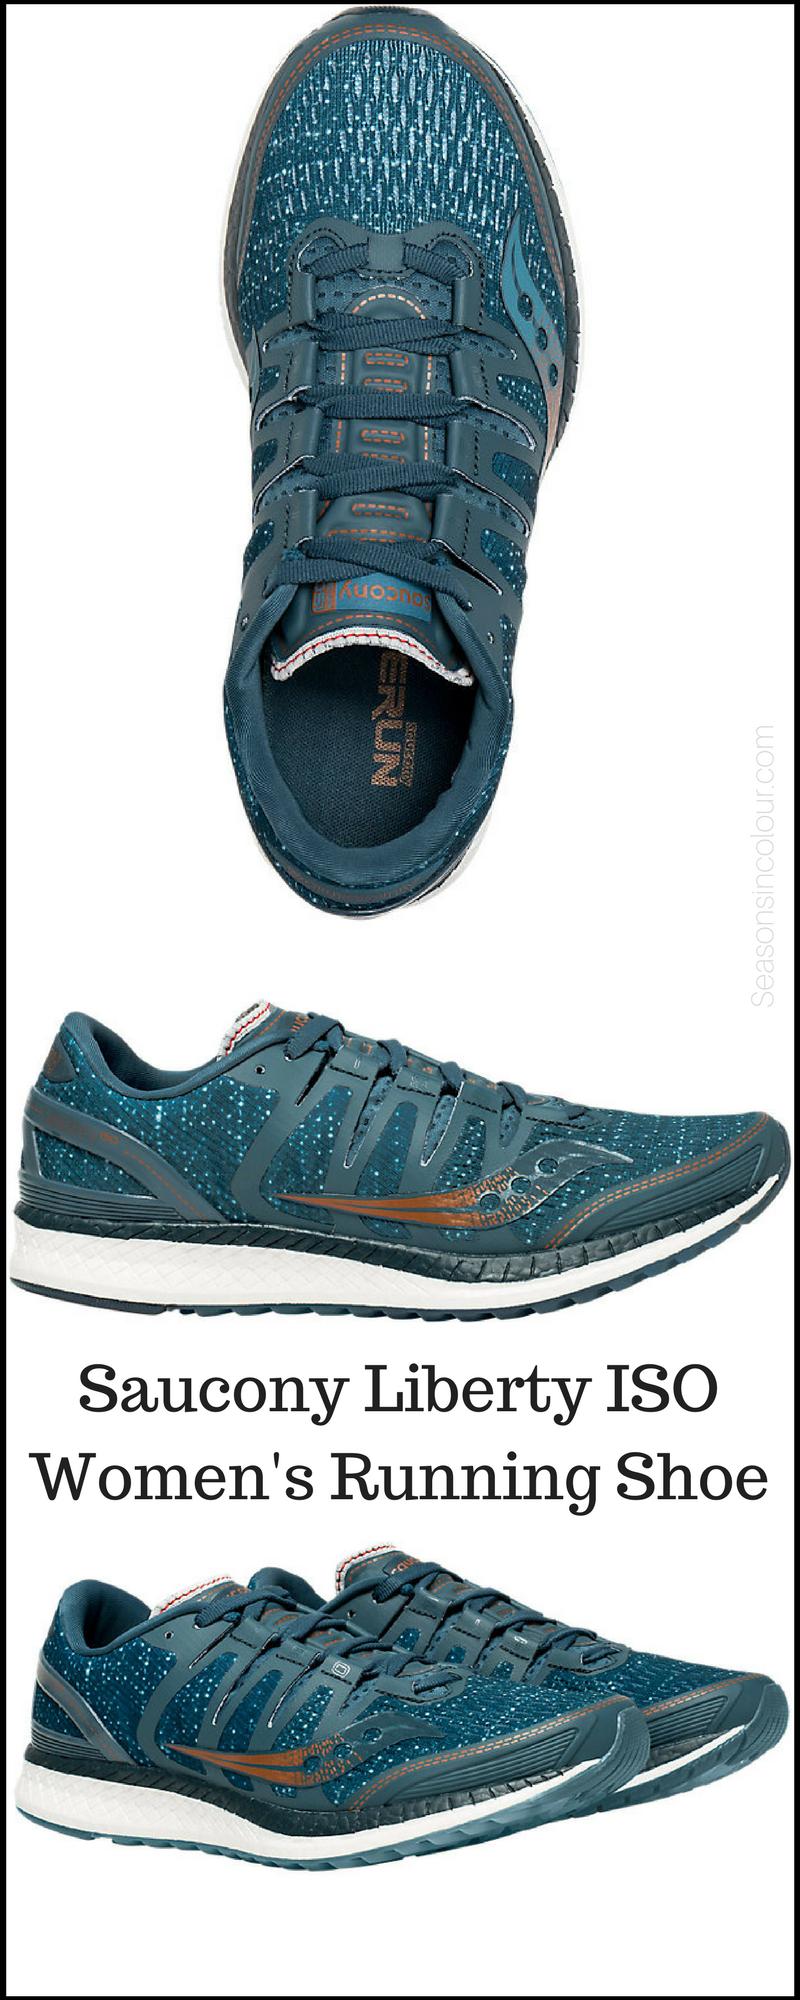 47bac9e1d2a8 Saucony Liberty ISO Women s Running Shoe